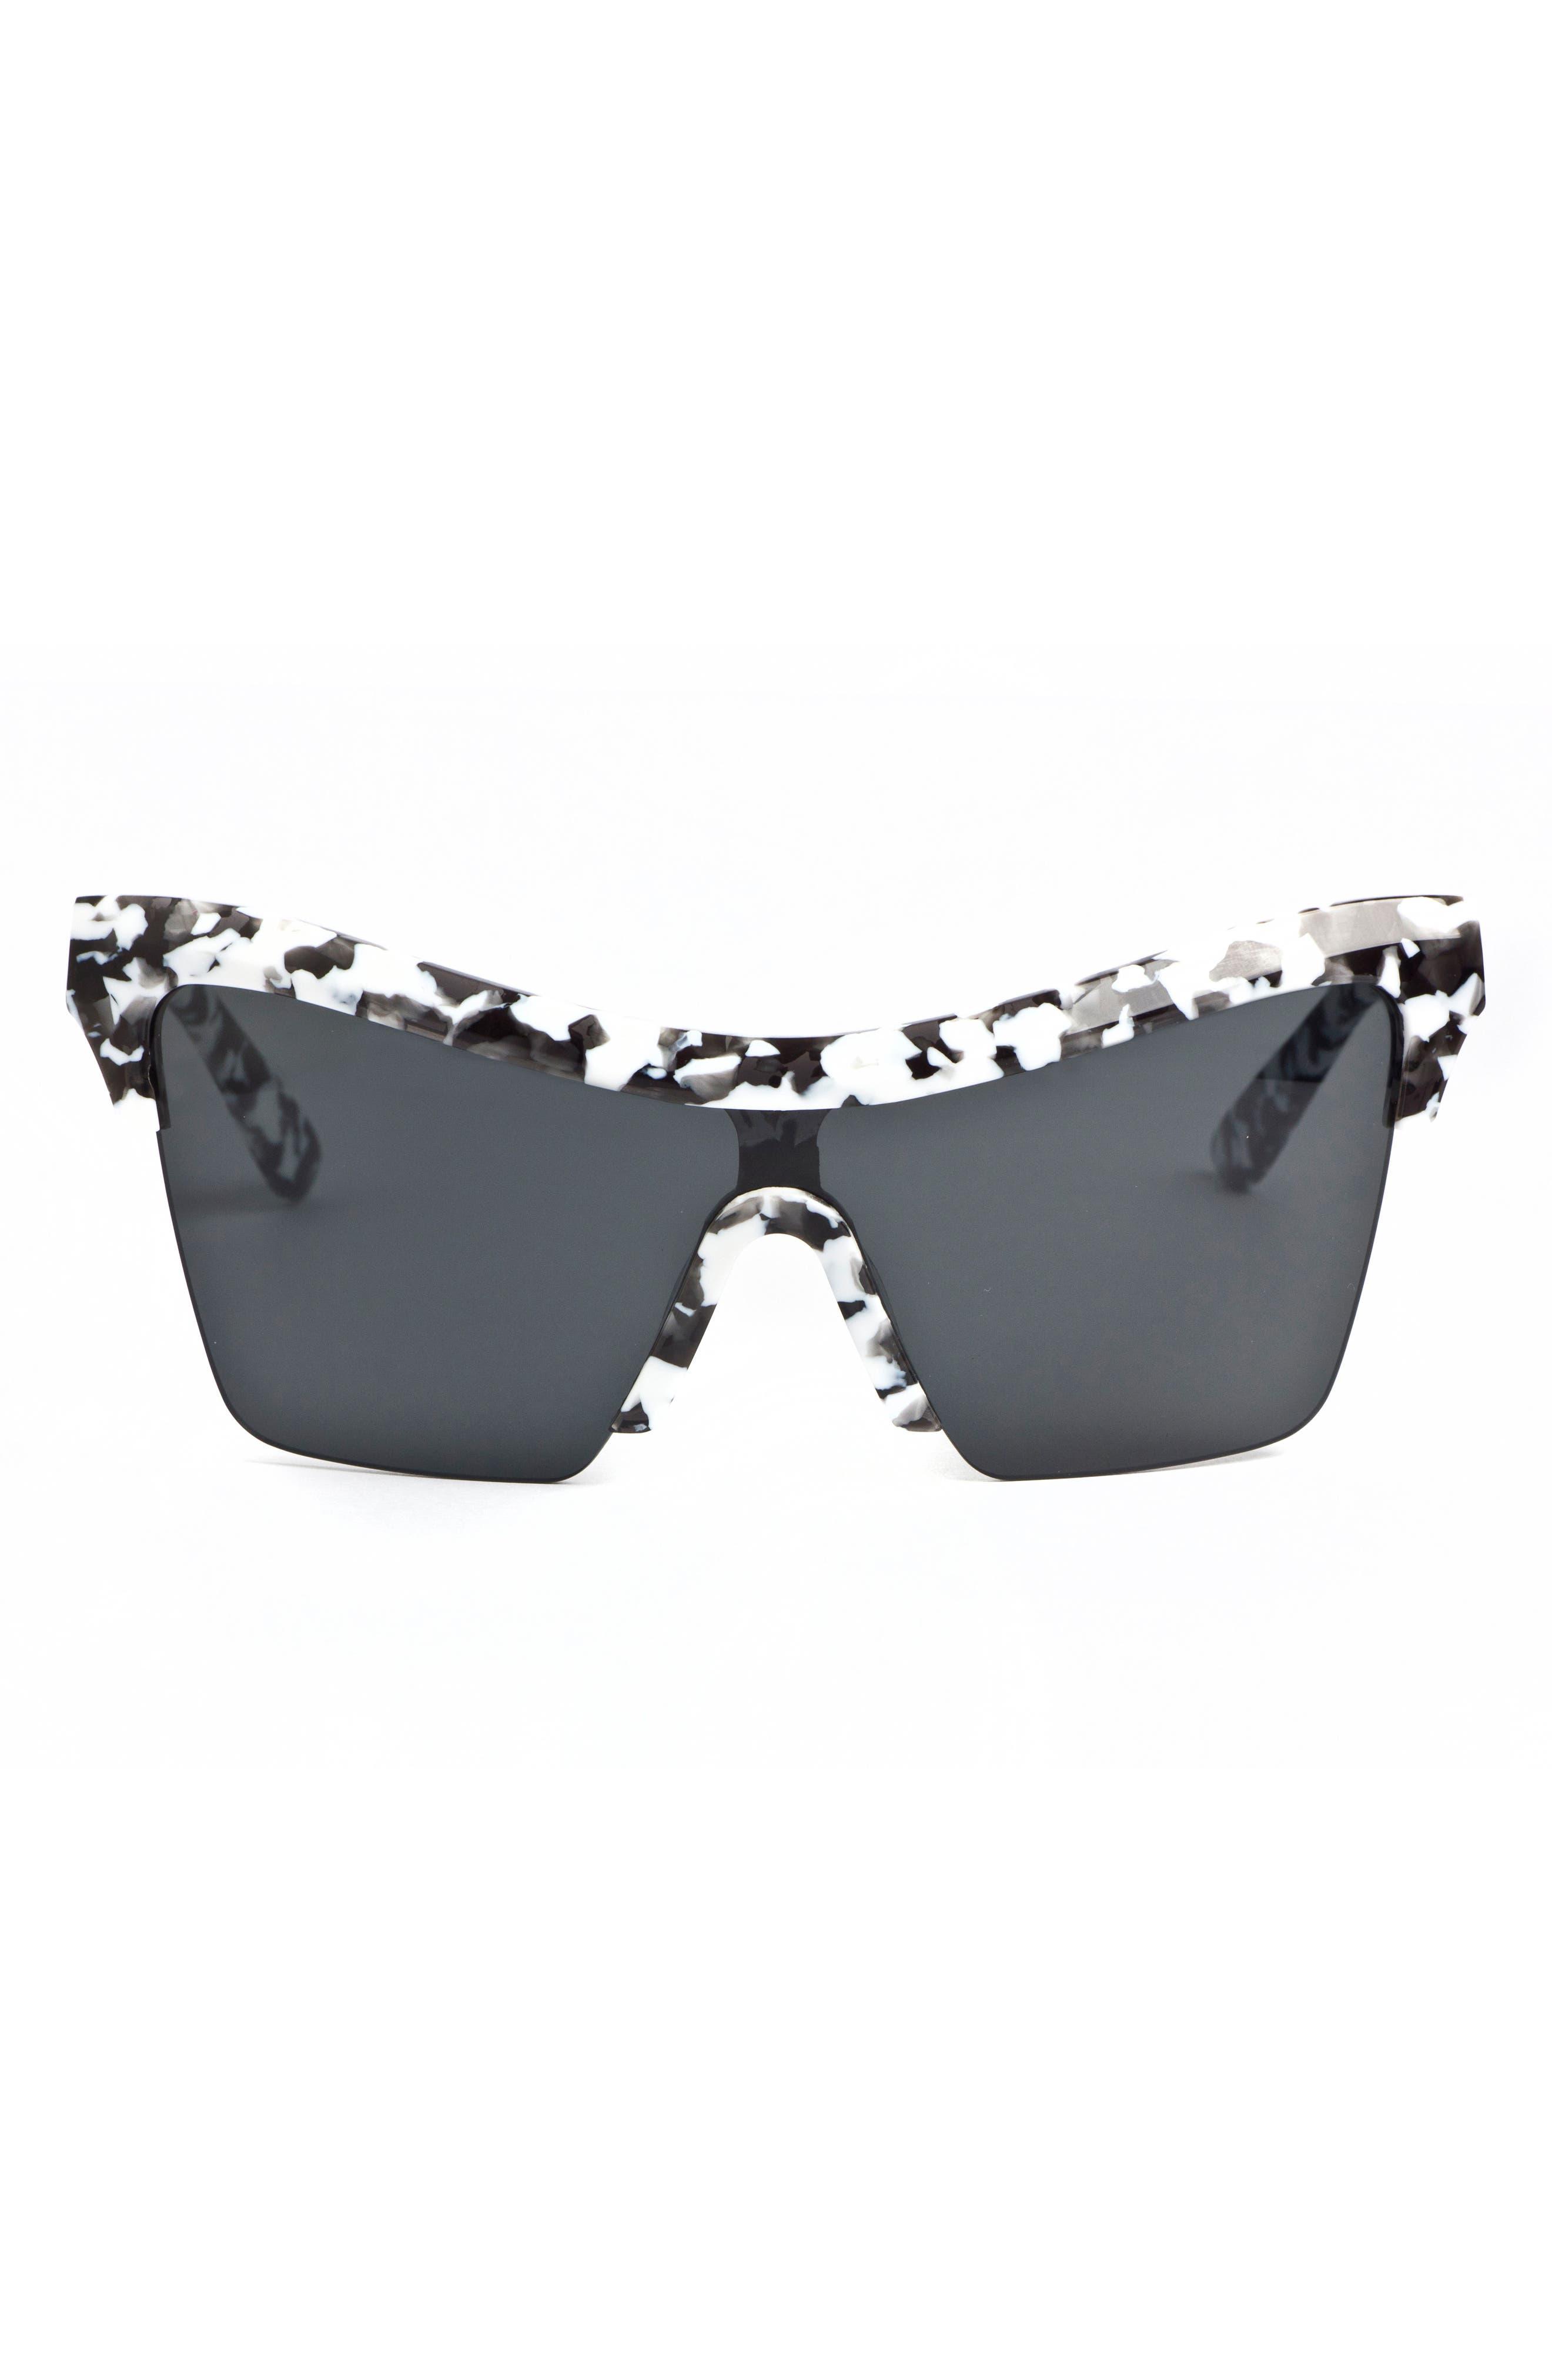 Passport Control 68mm Sunglasses,                             Alternate thumbnail 3, color,                             WHITE CAMO